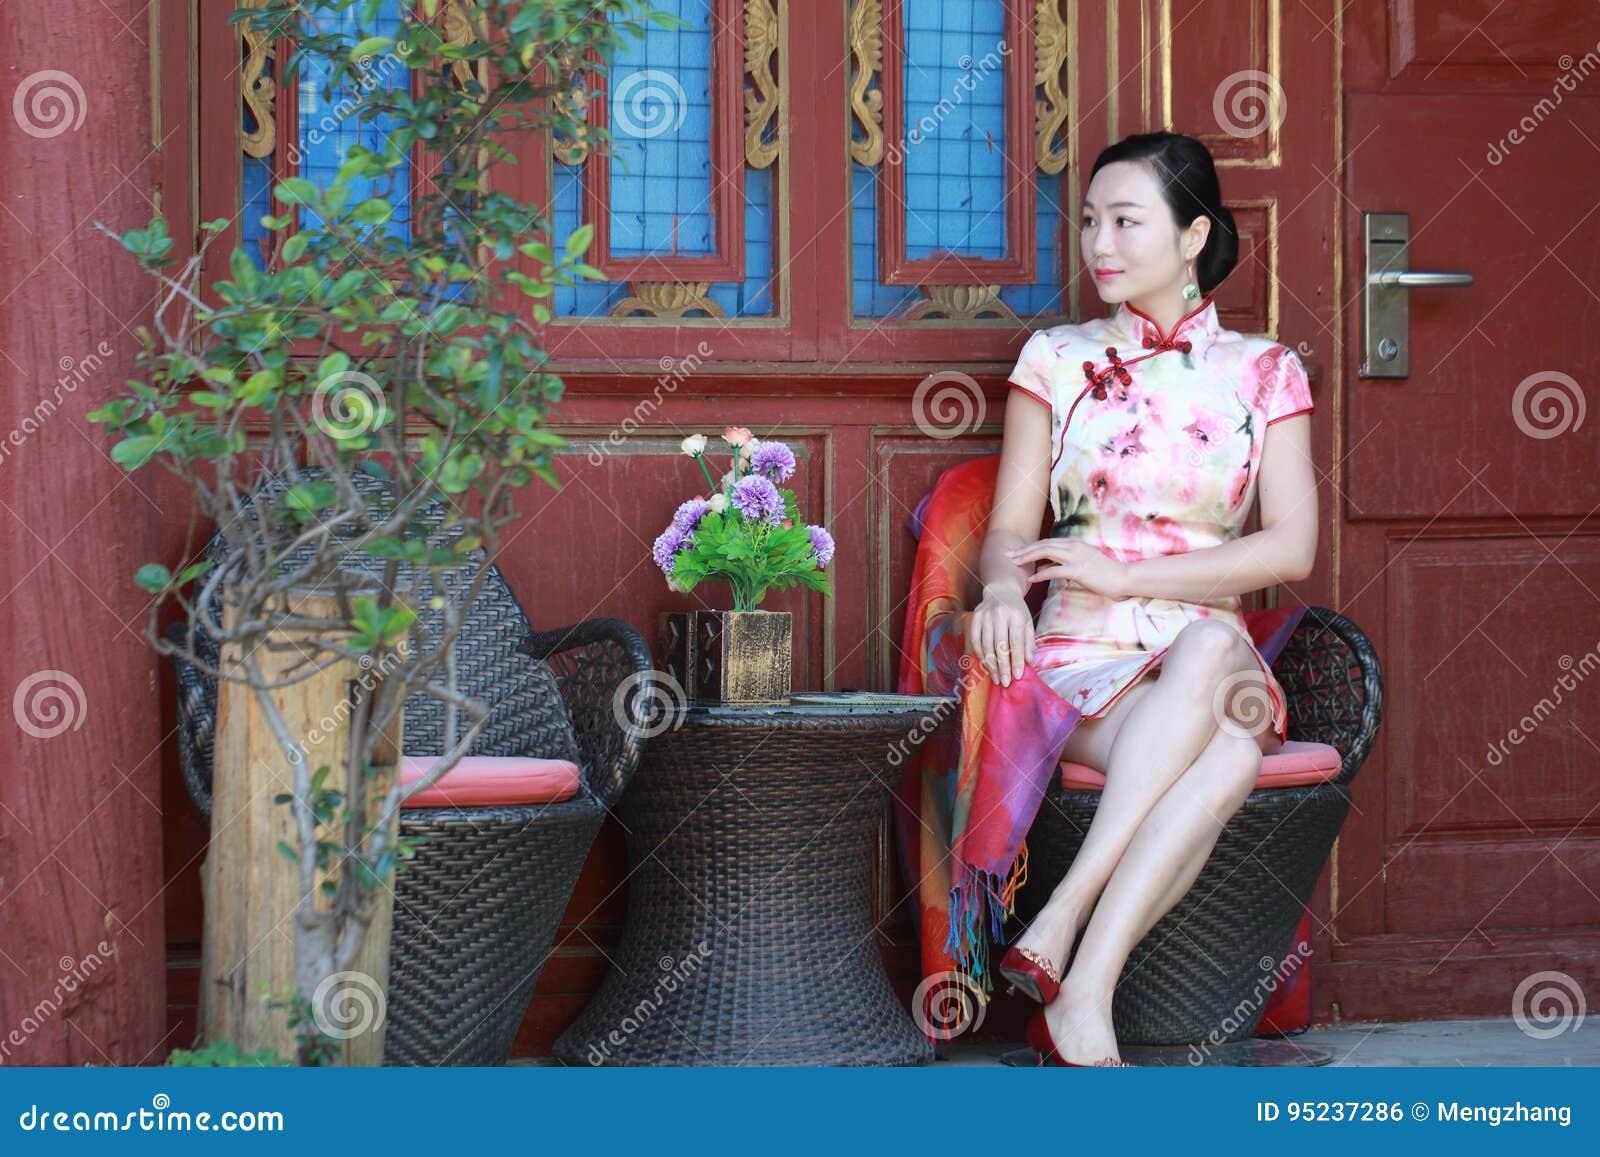 Asian Chinese girls wears cheongsam enjoy holiday in lijiang ancient town